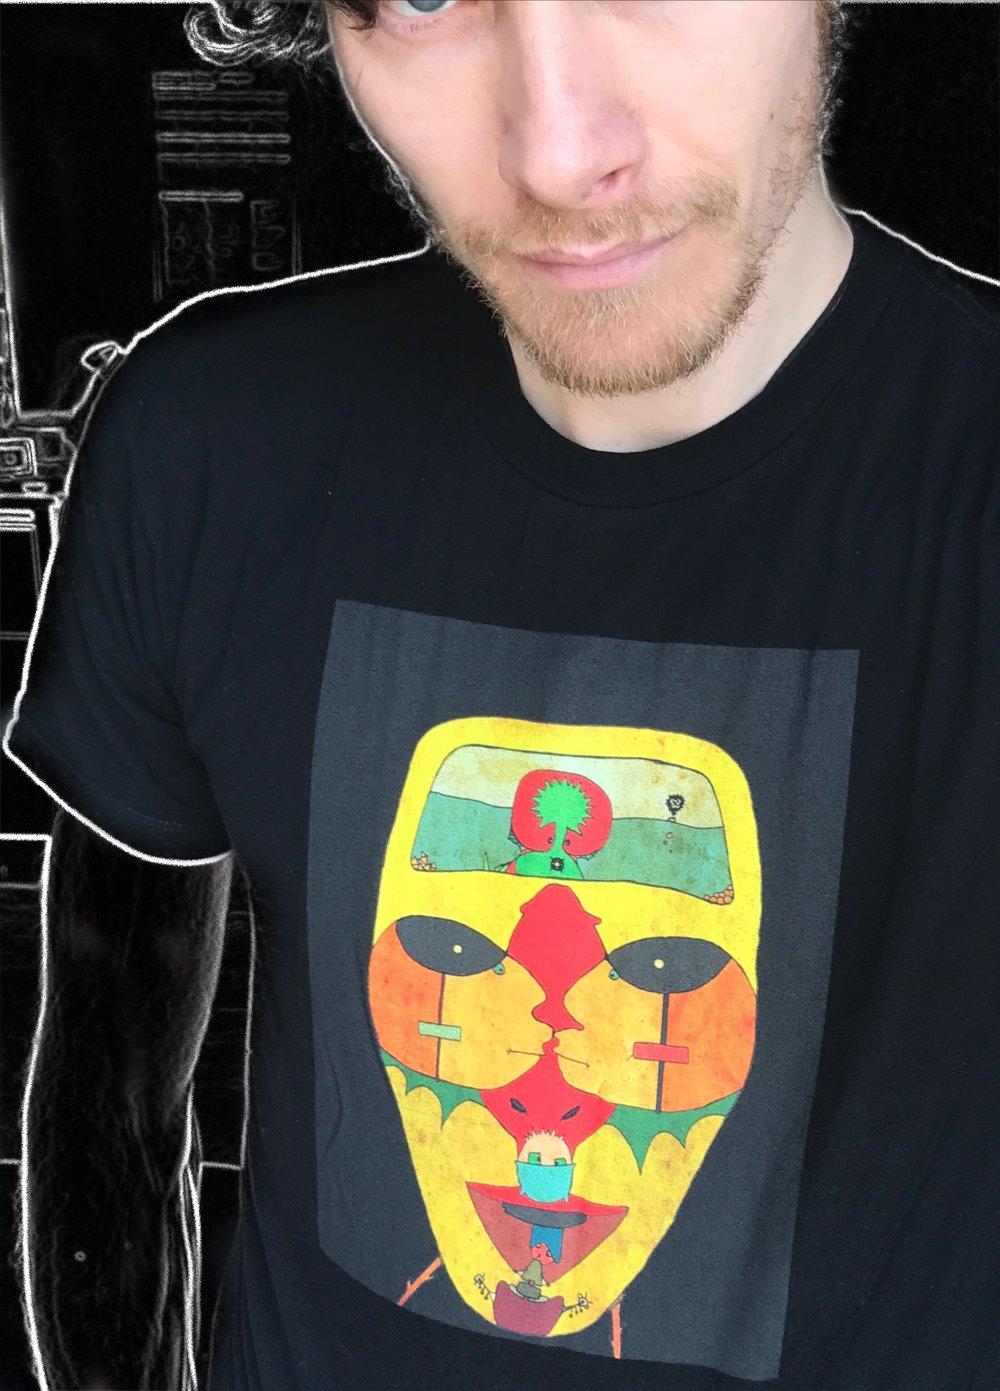 sample tshirt.jpeg